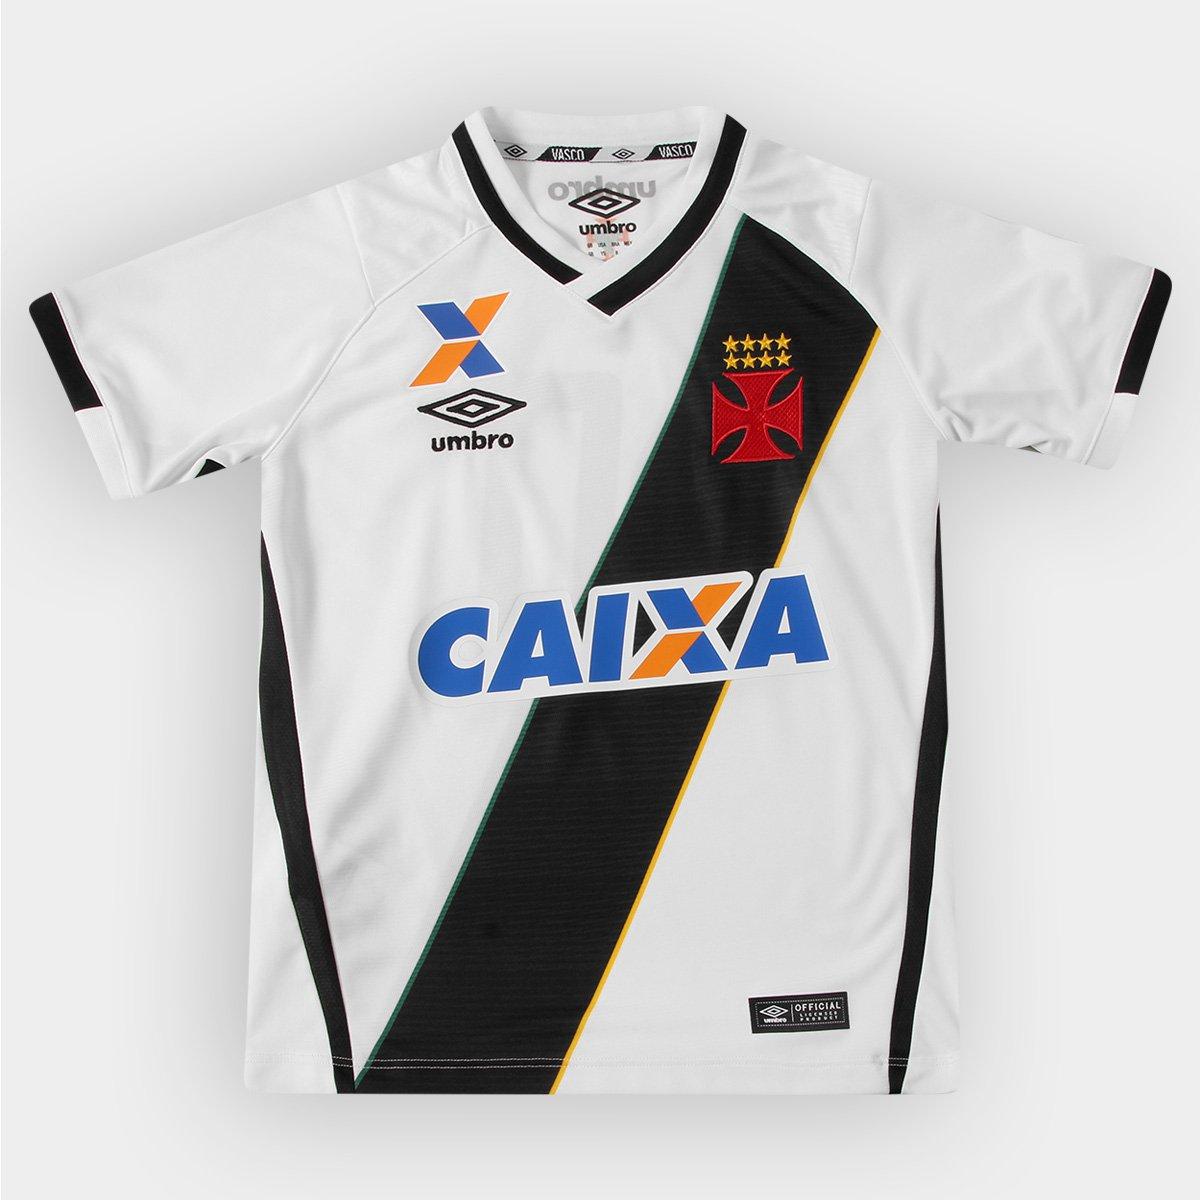 Camisa Umbro Vasco II 16 17 nº 10 Juvenil - Compre Agora  bc5324f6430ae